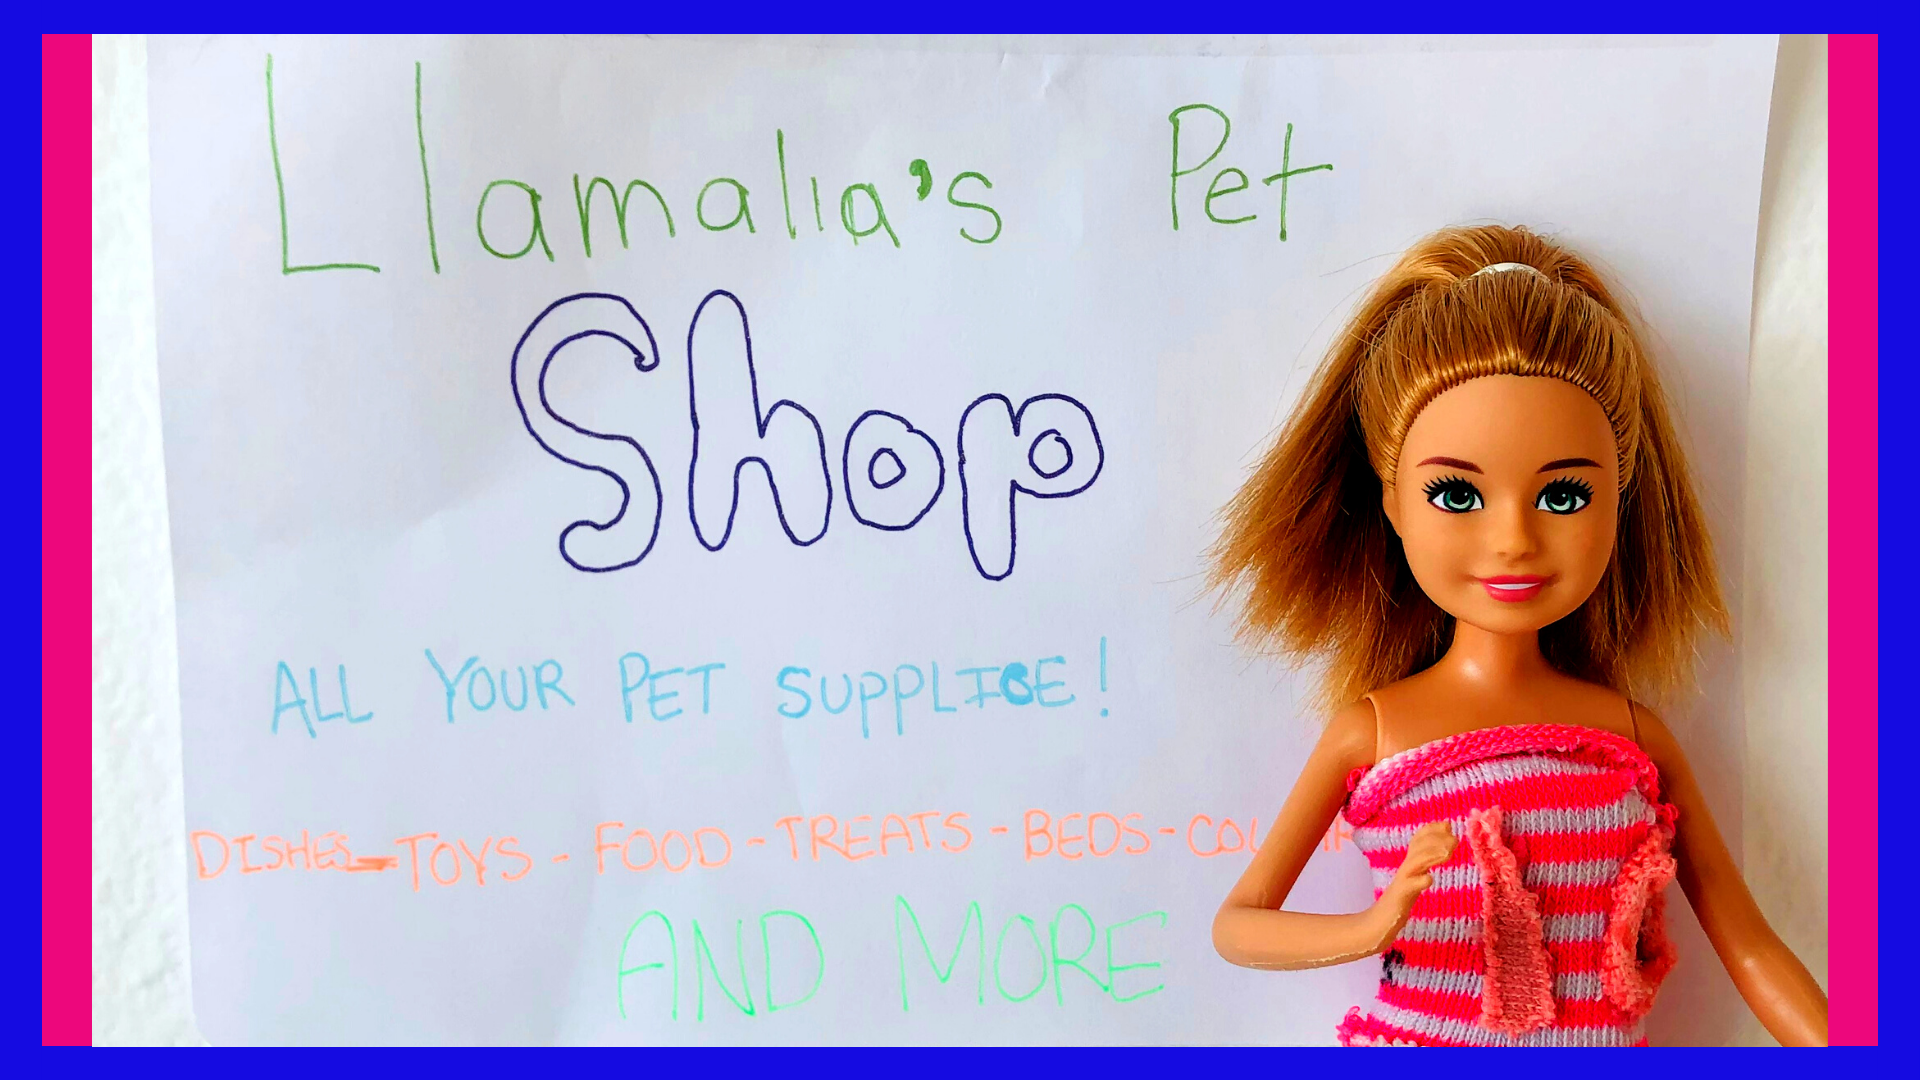 Llamalia's Pet Care in Barbie Stories for Kids, The Crazy Kramer's.